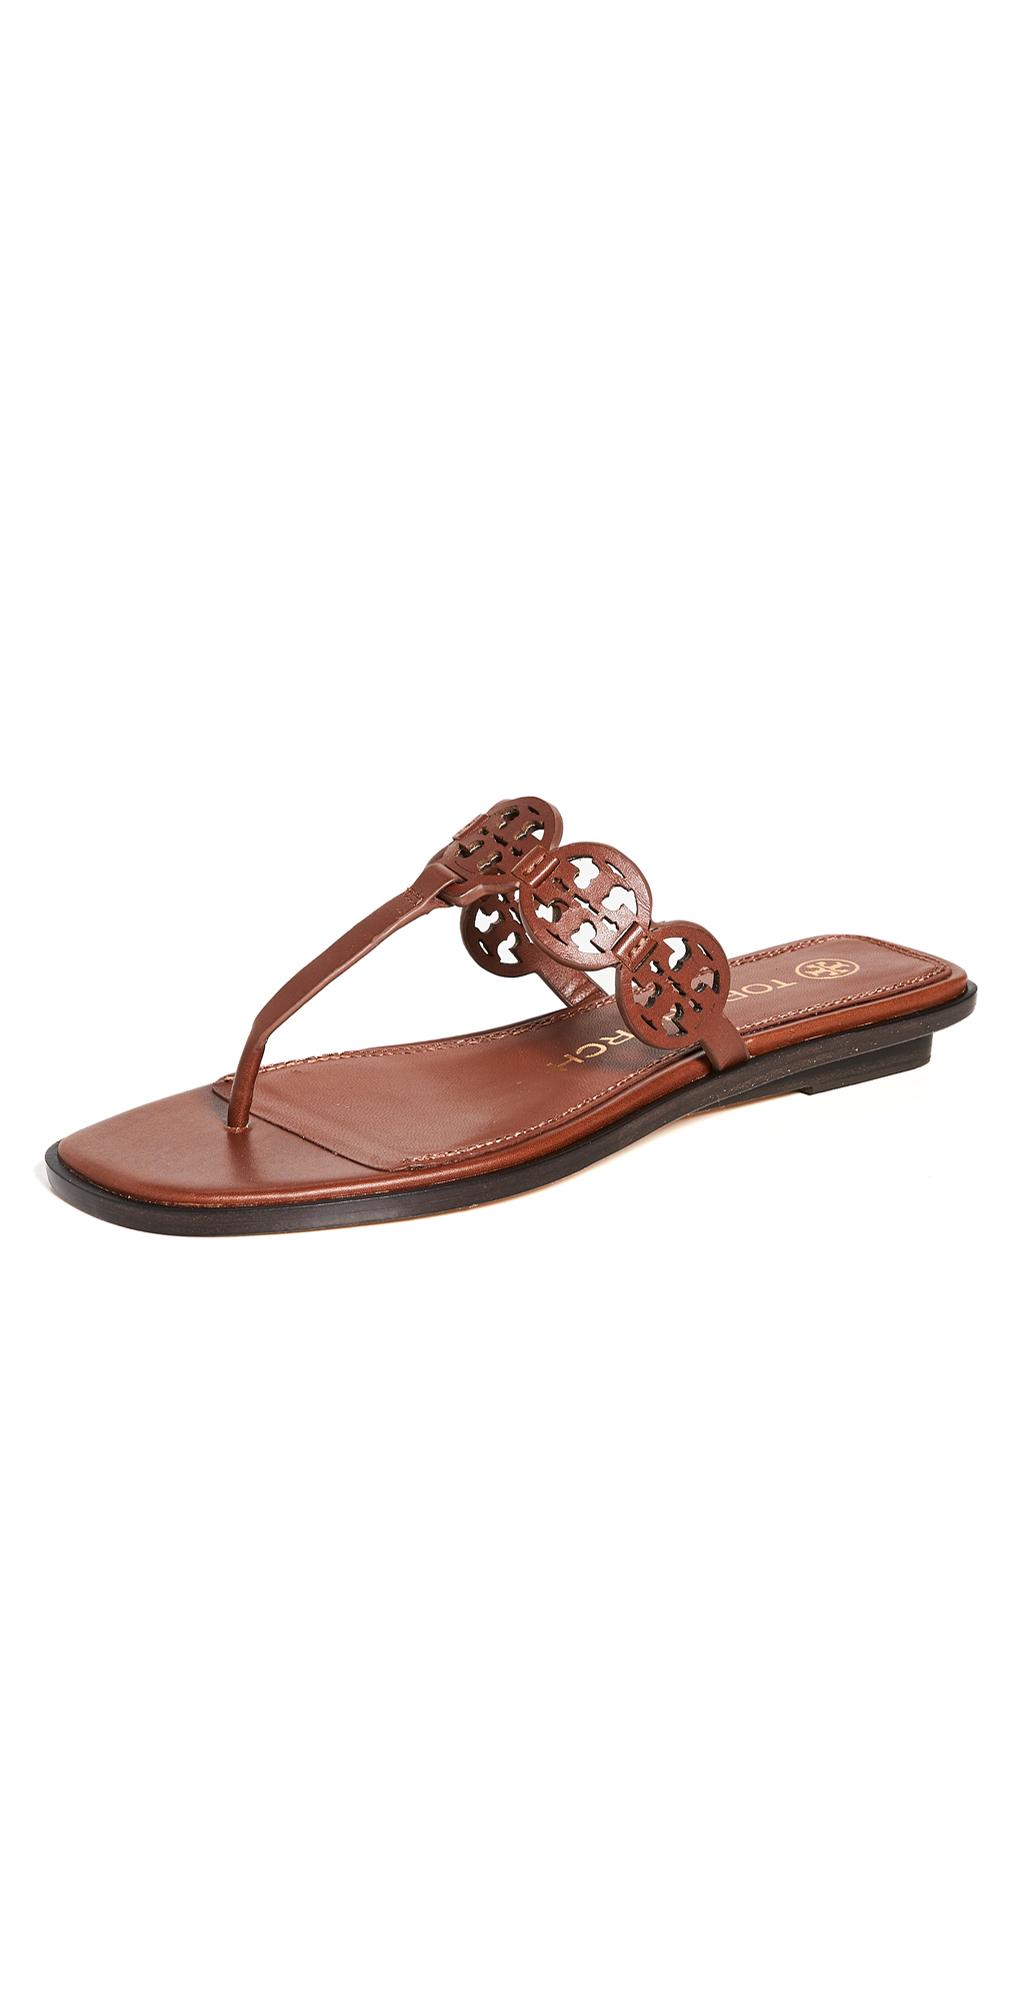 Tory Burch Tiny Miller 10mm Thong Sandals